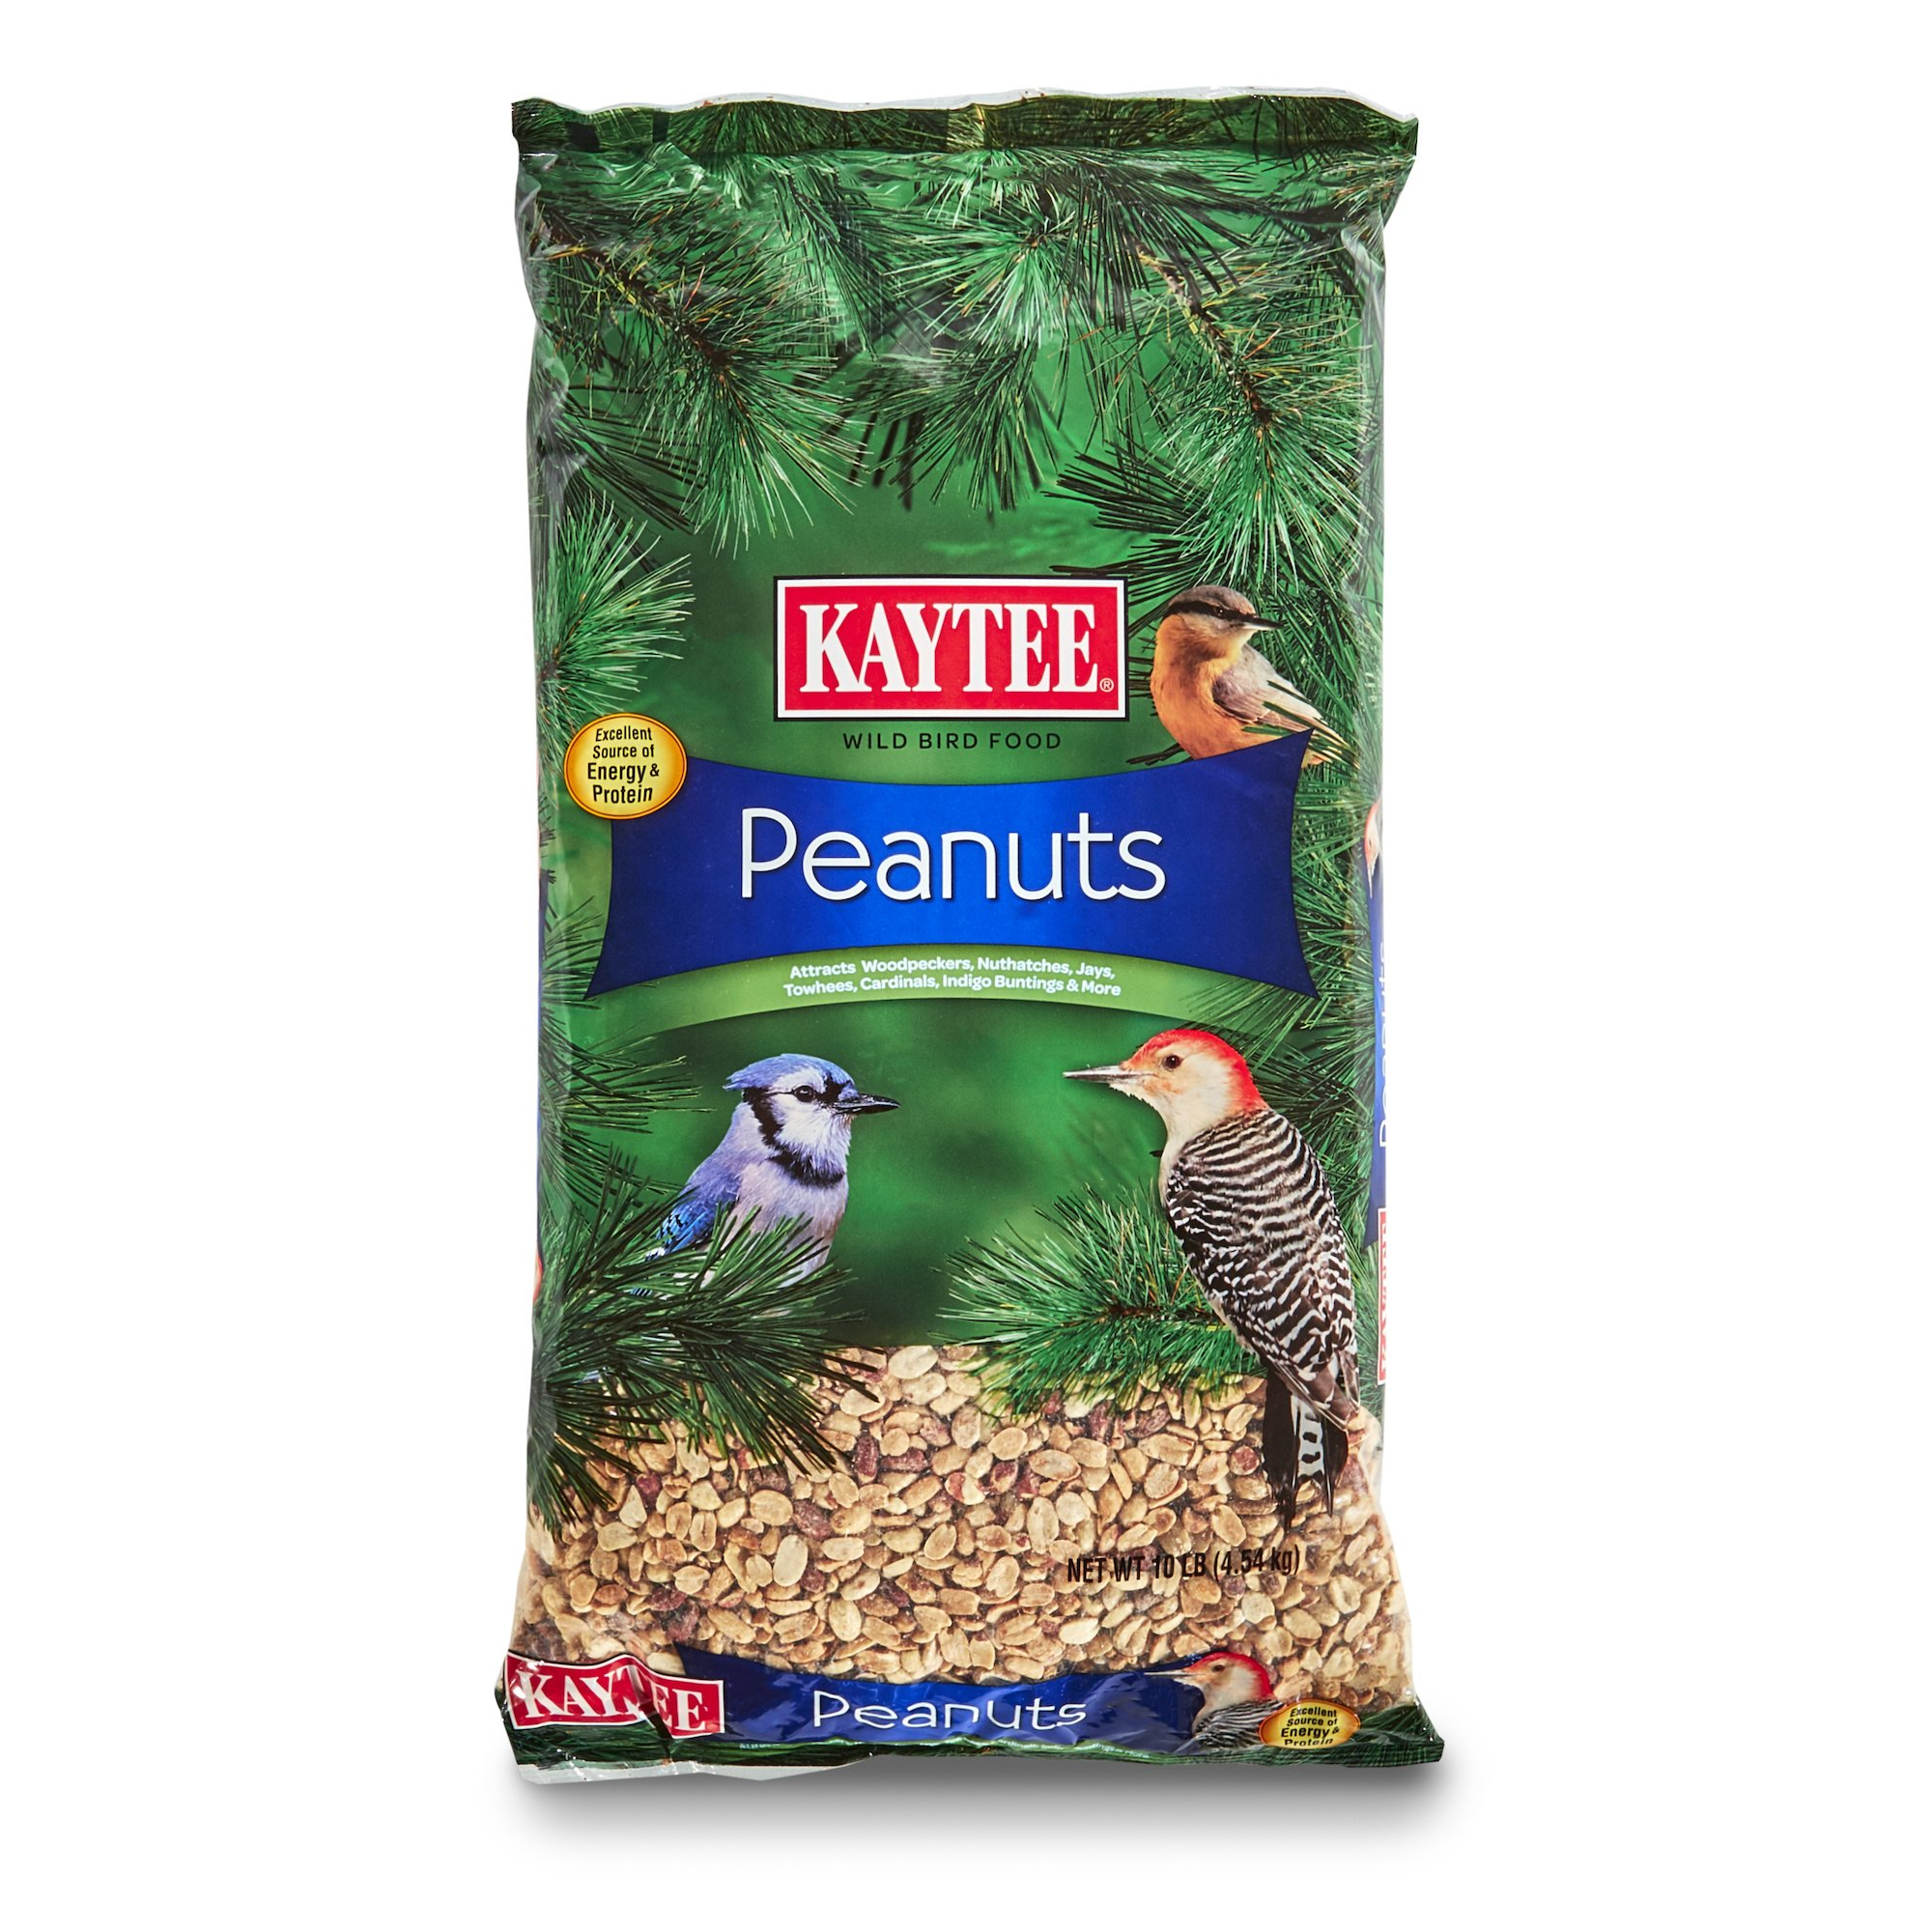 Kaytee Peanuts for Wild Birds, 10-Pound